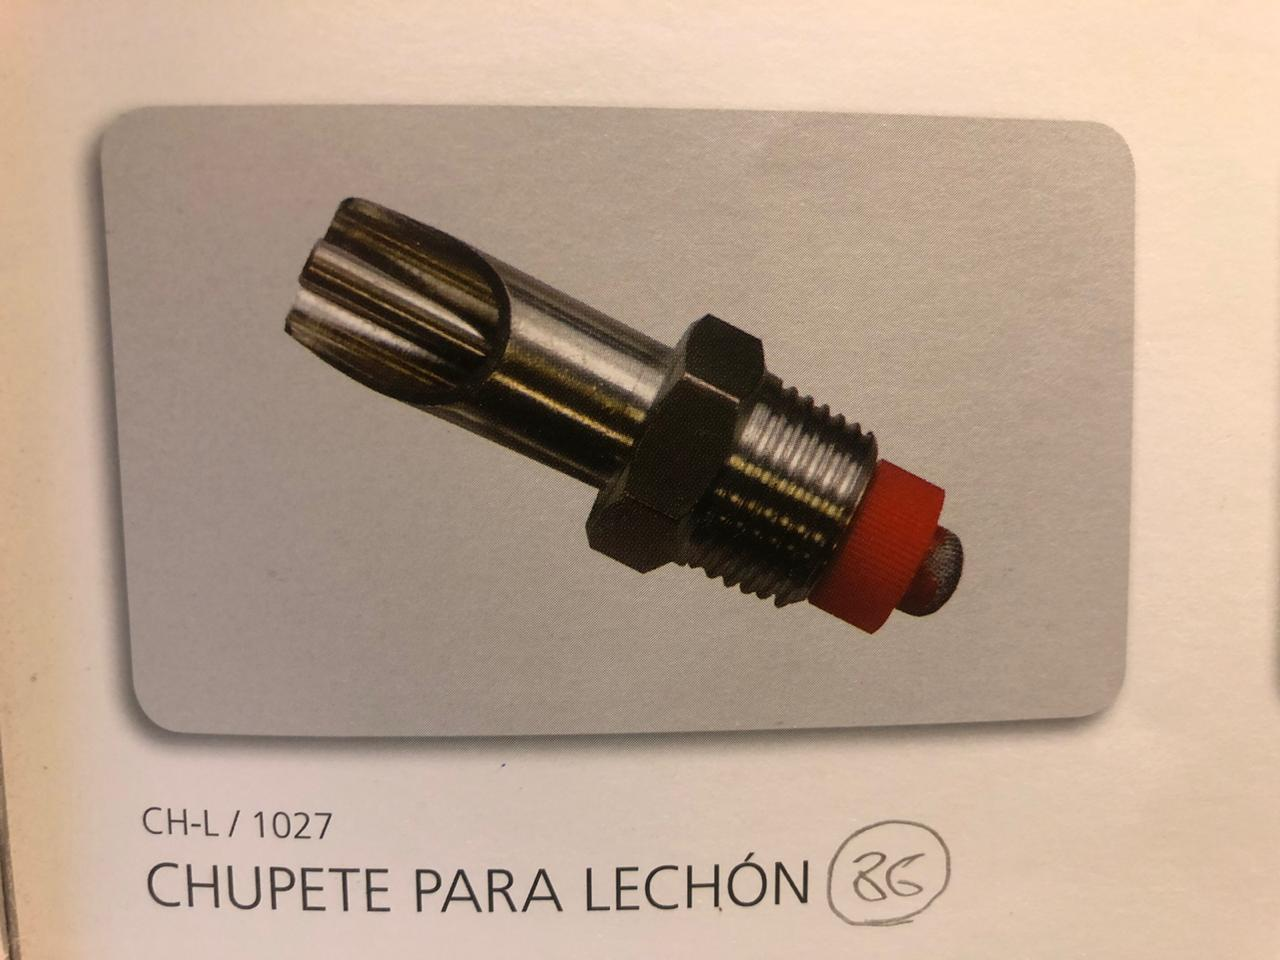 Termoplast Chupete Lechon 1027